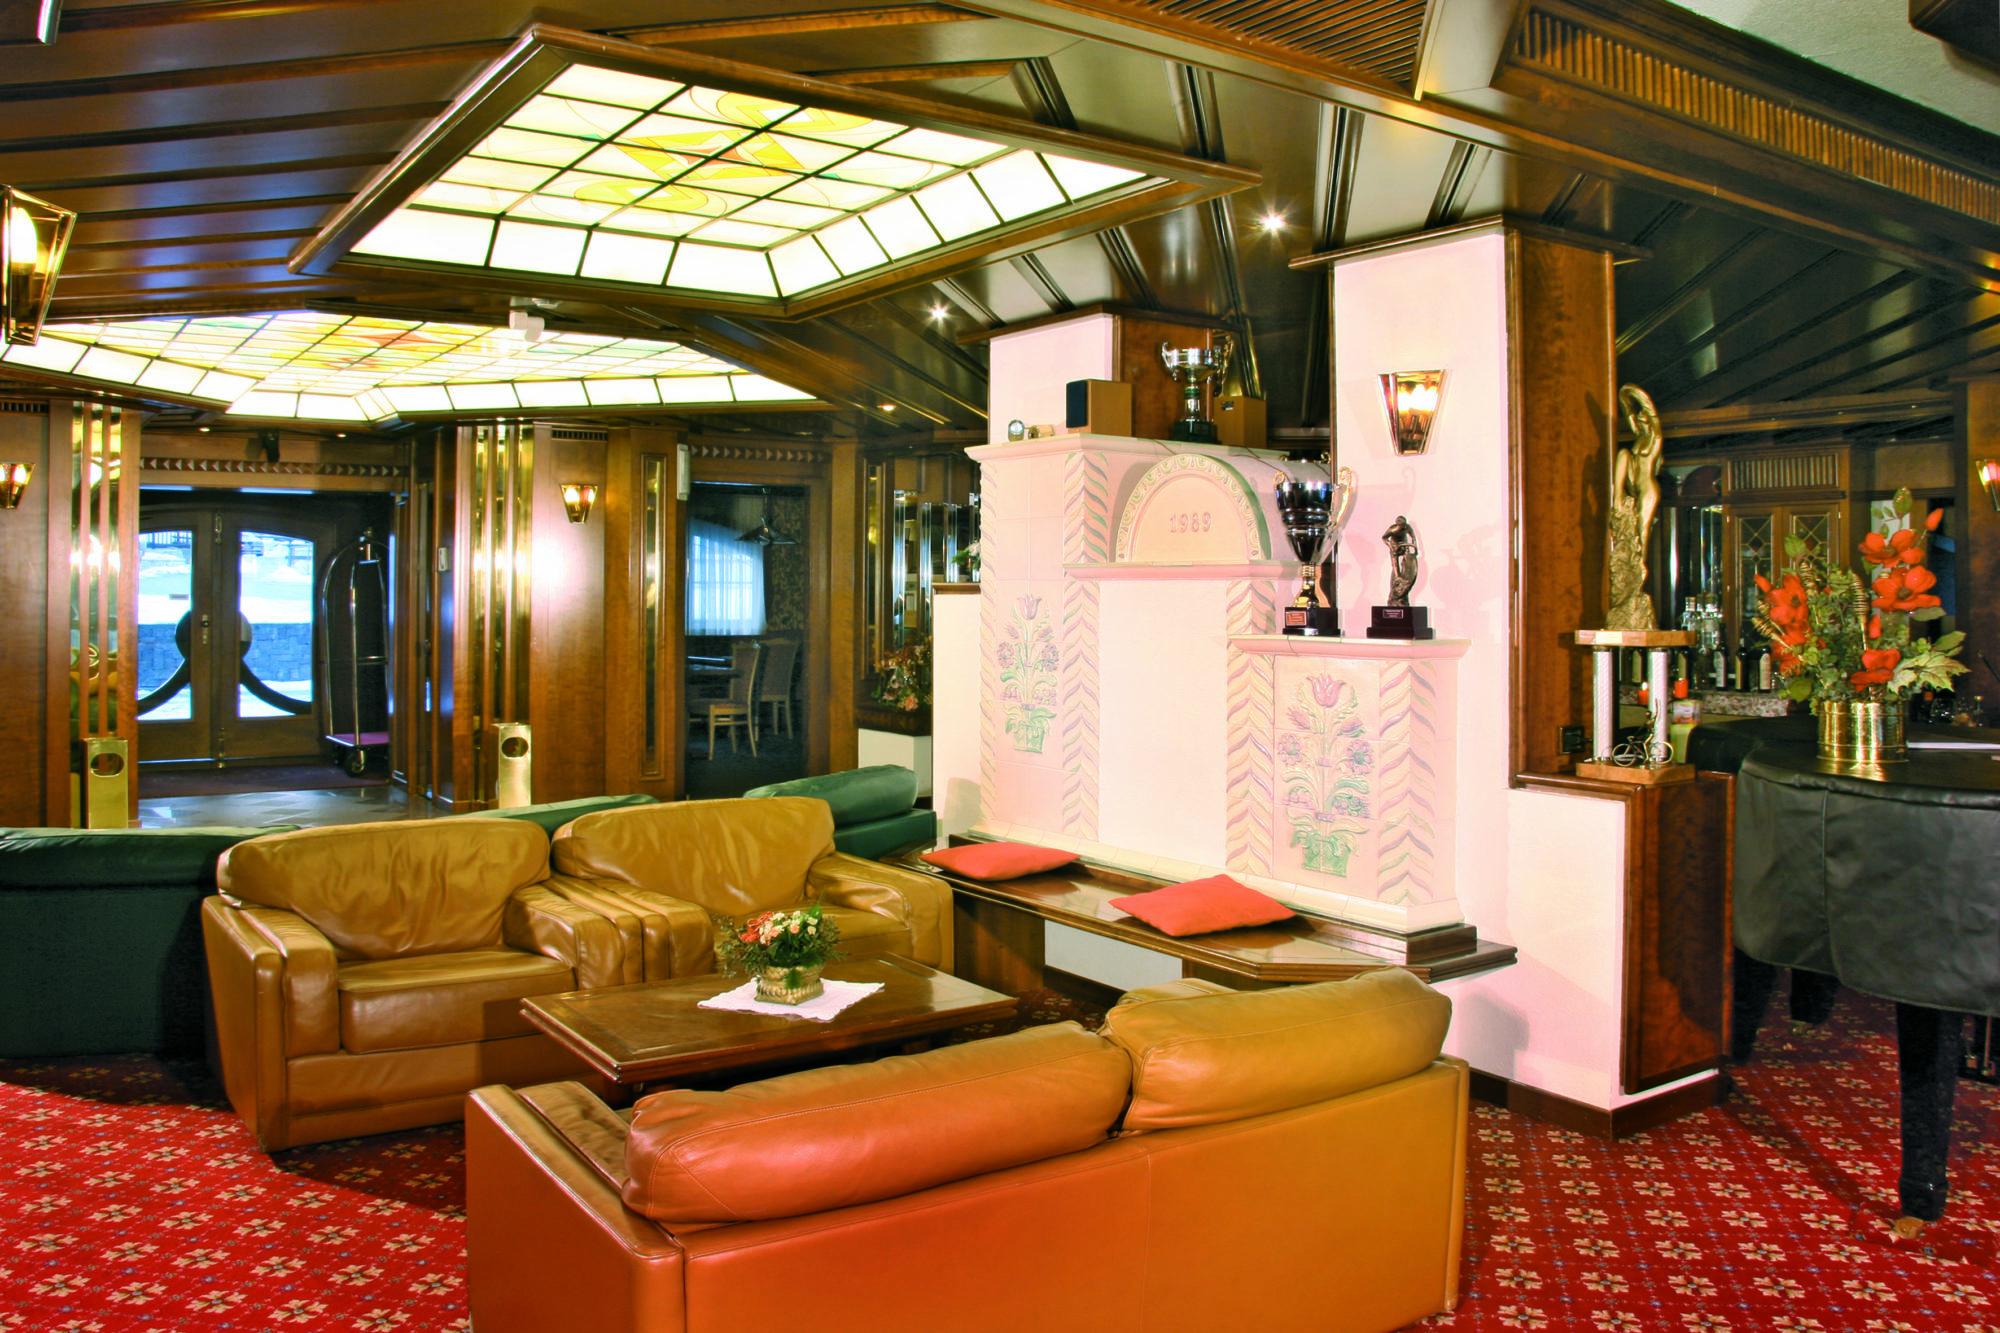 4 Hotel Rubino - Hall